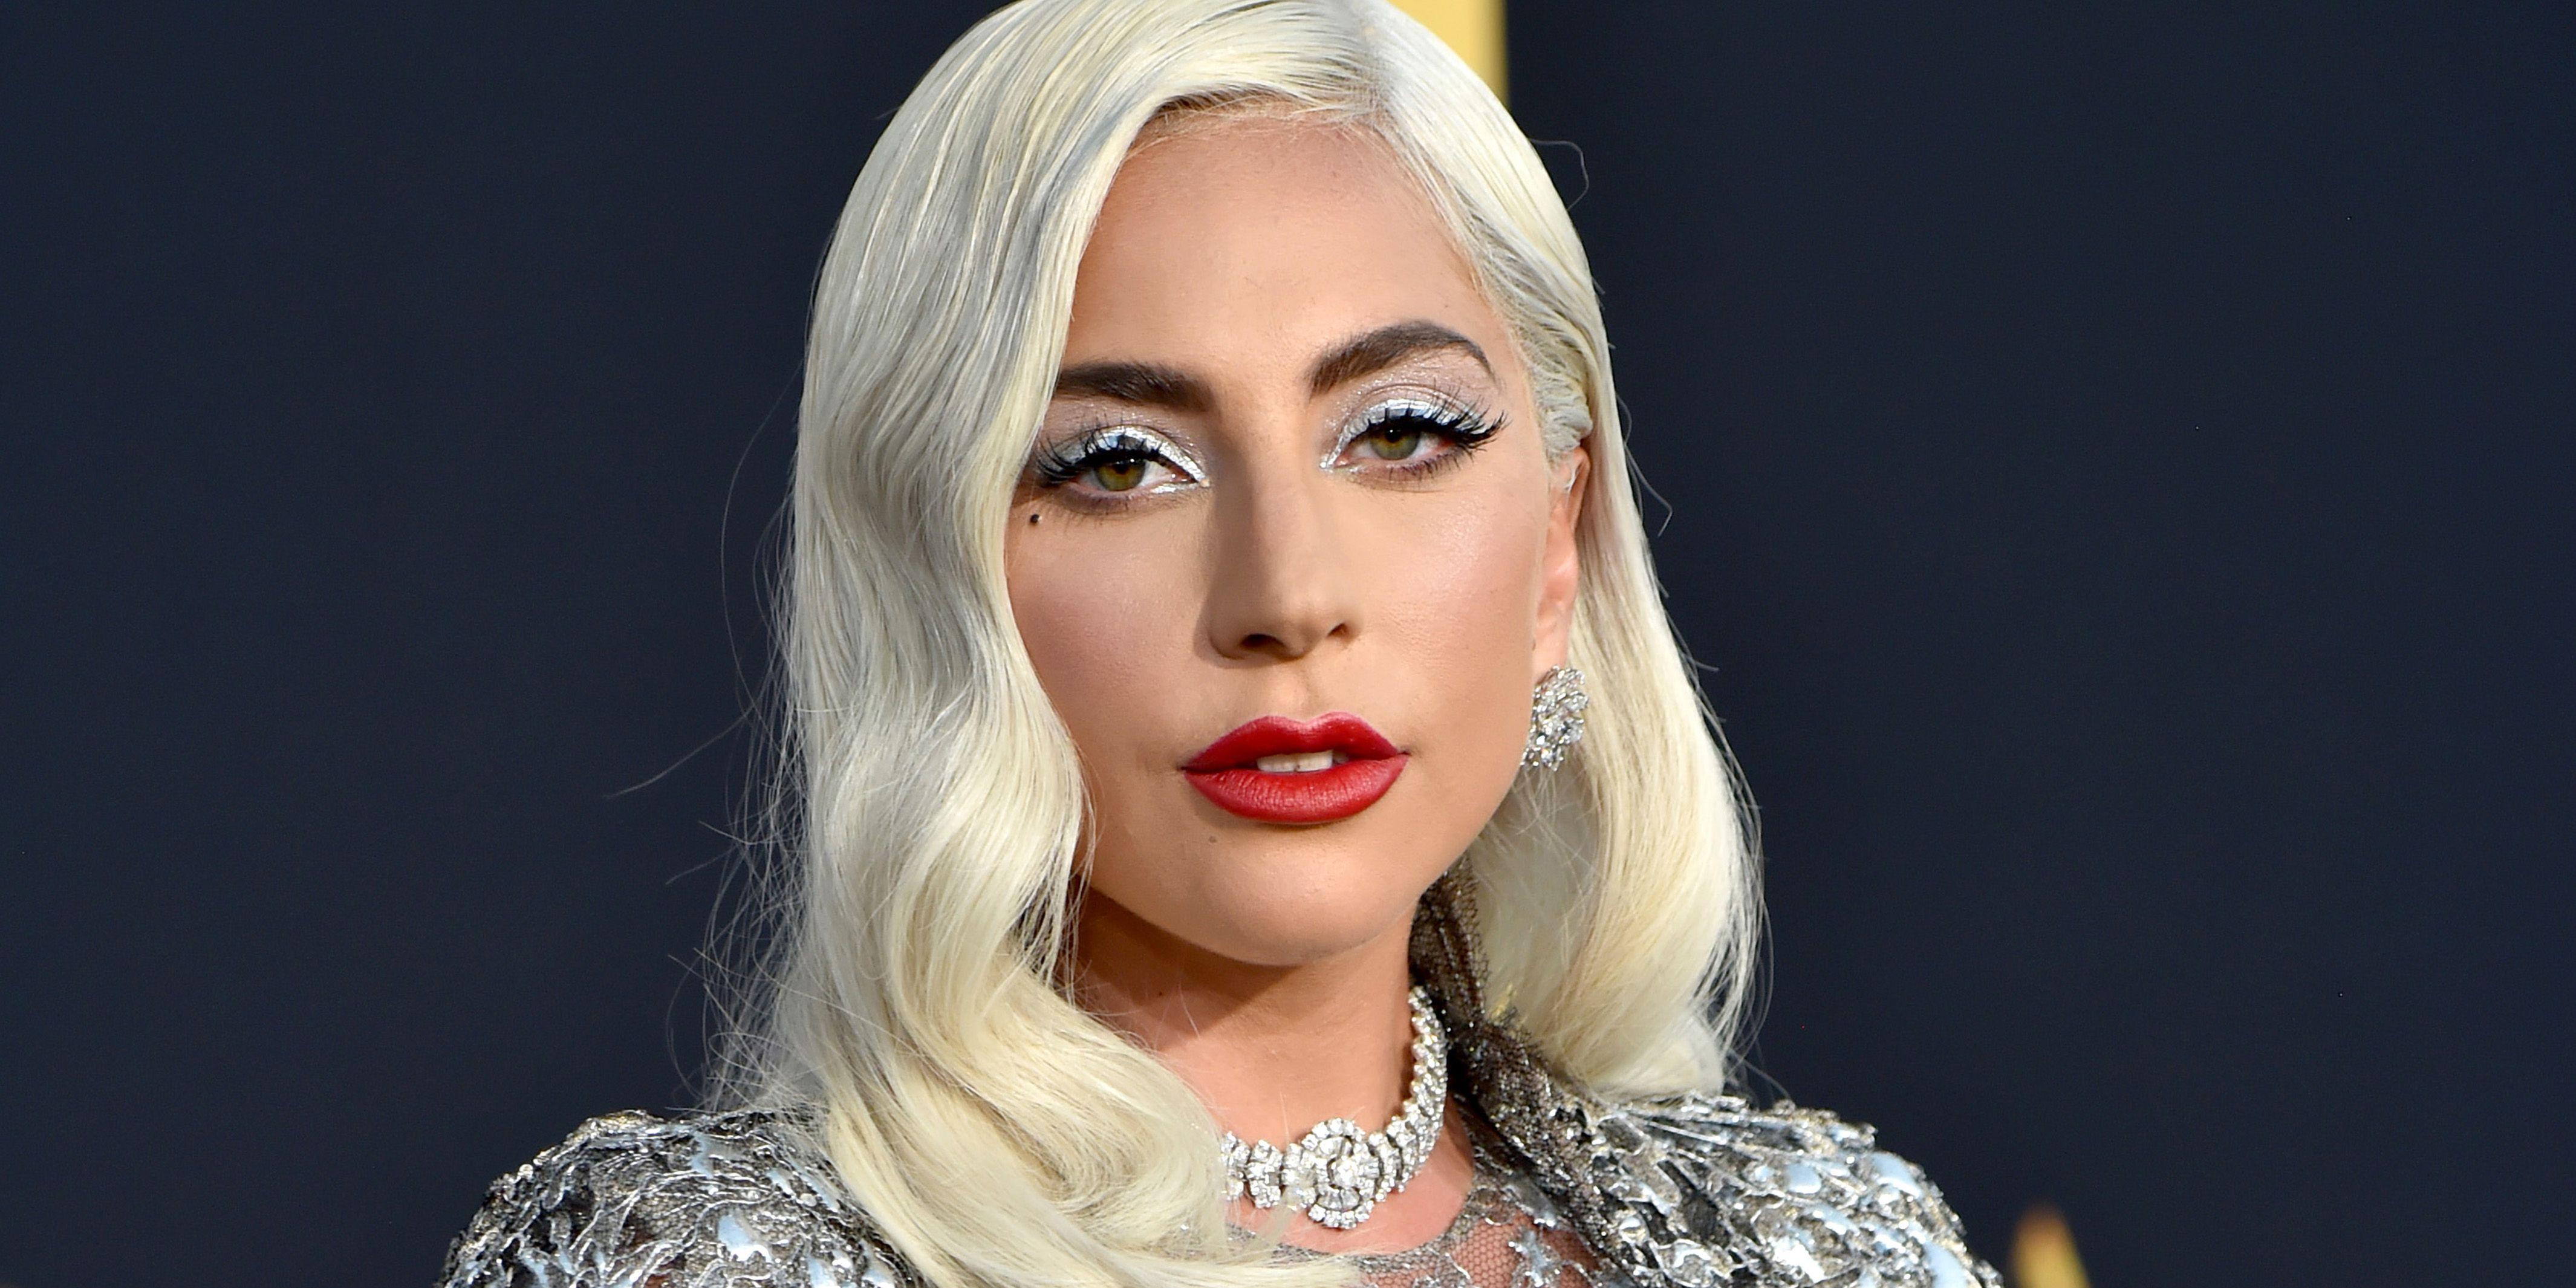 Lady Gaga at A Star Is Born premiere